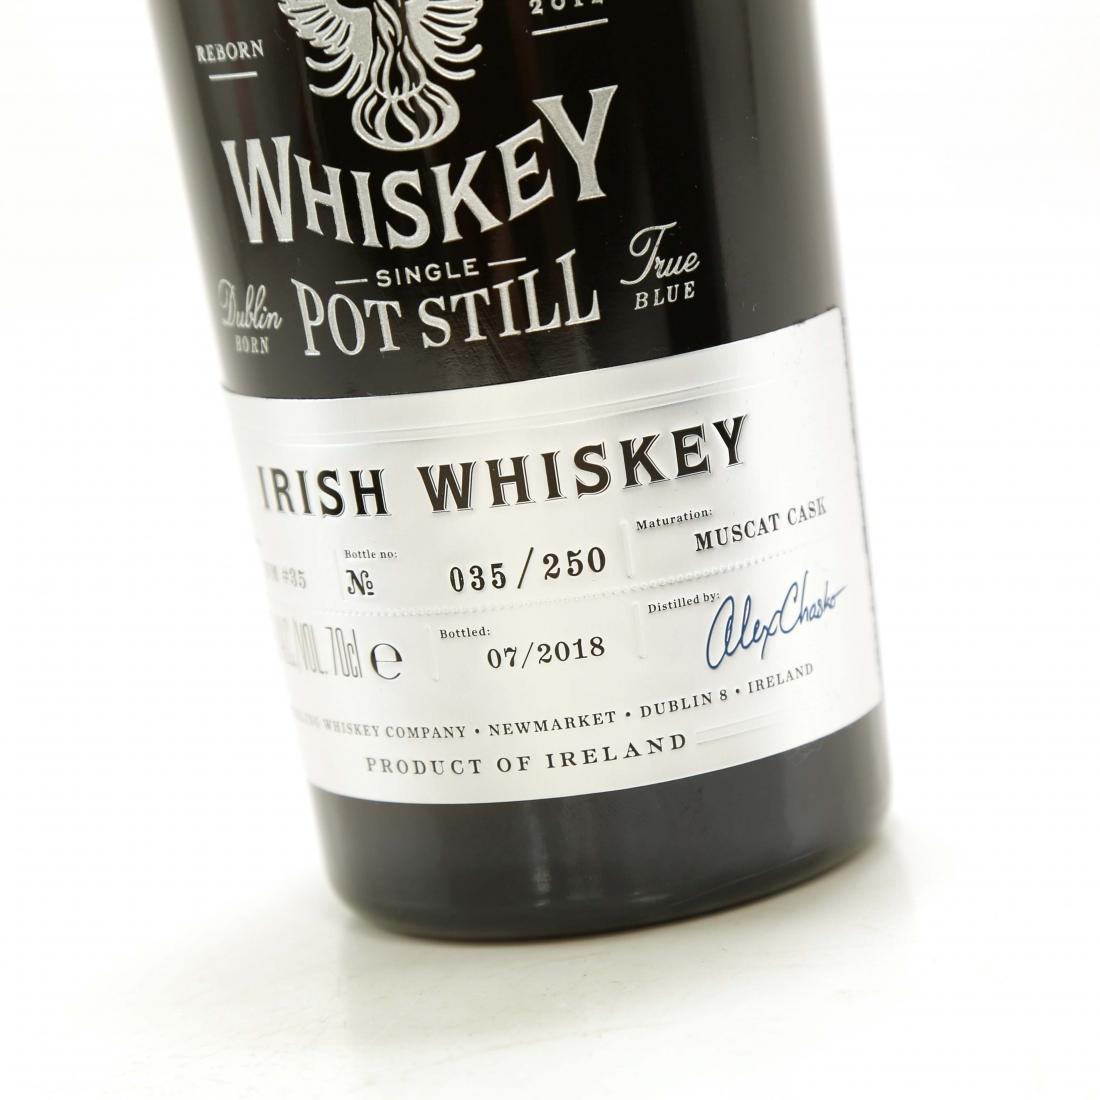 Teeling Celebratory Single Pot Still Whiskey / Bottle #035